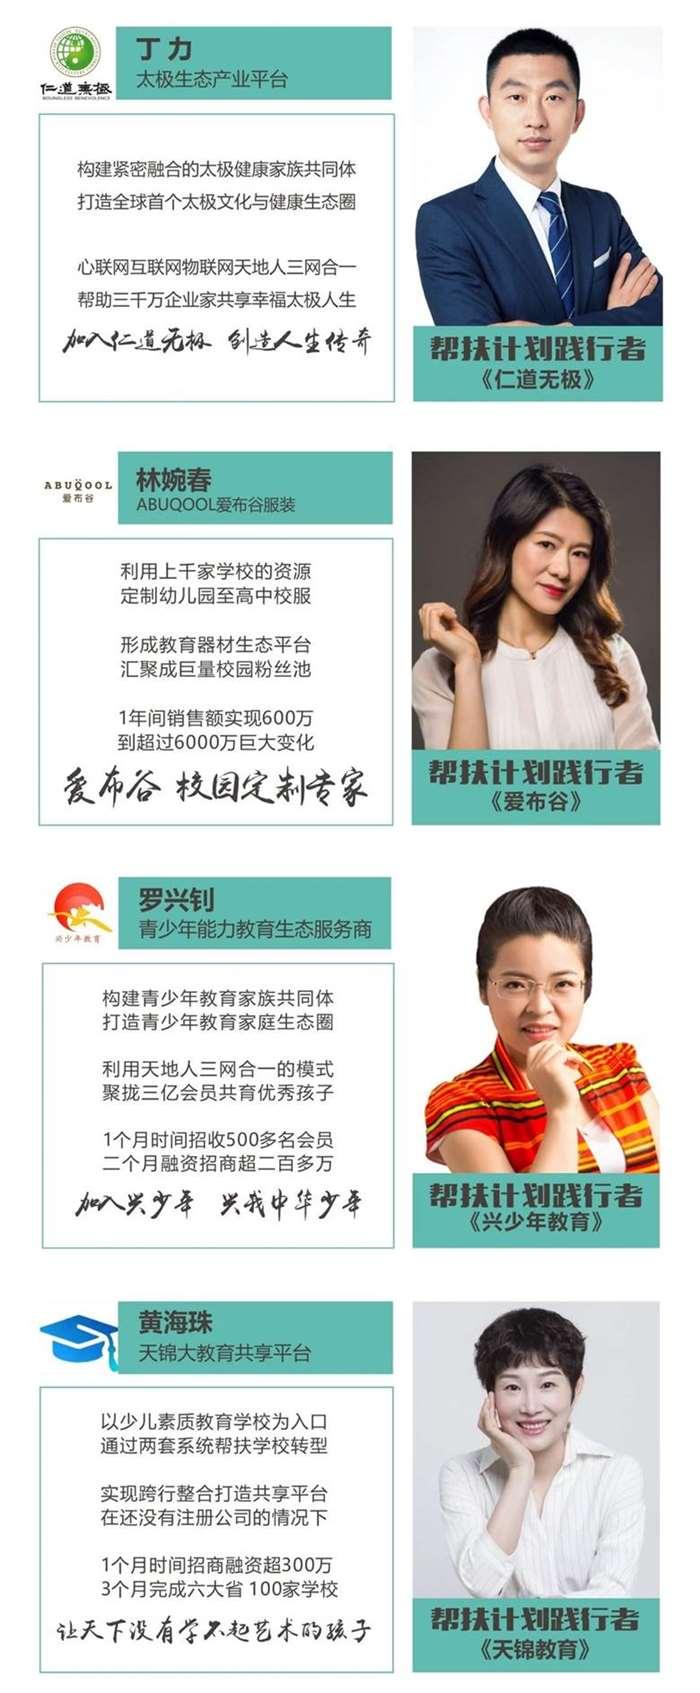 http://www.huodongxing.com/file/20191113/1063603644976/413617916206527.jpg